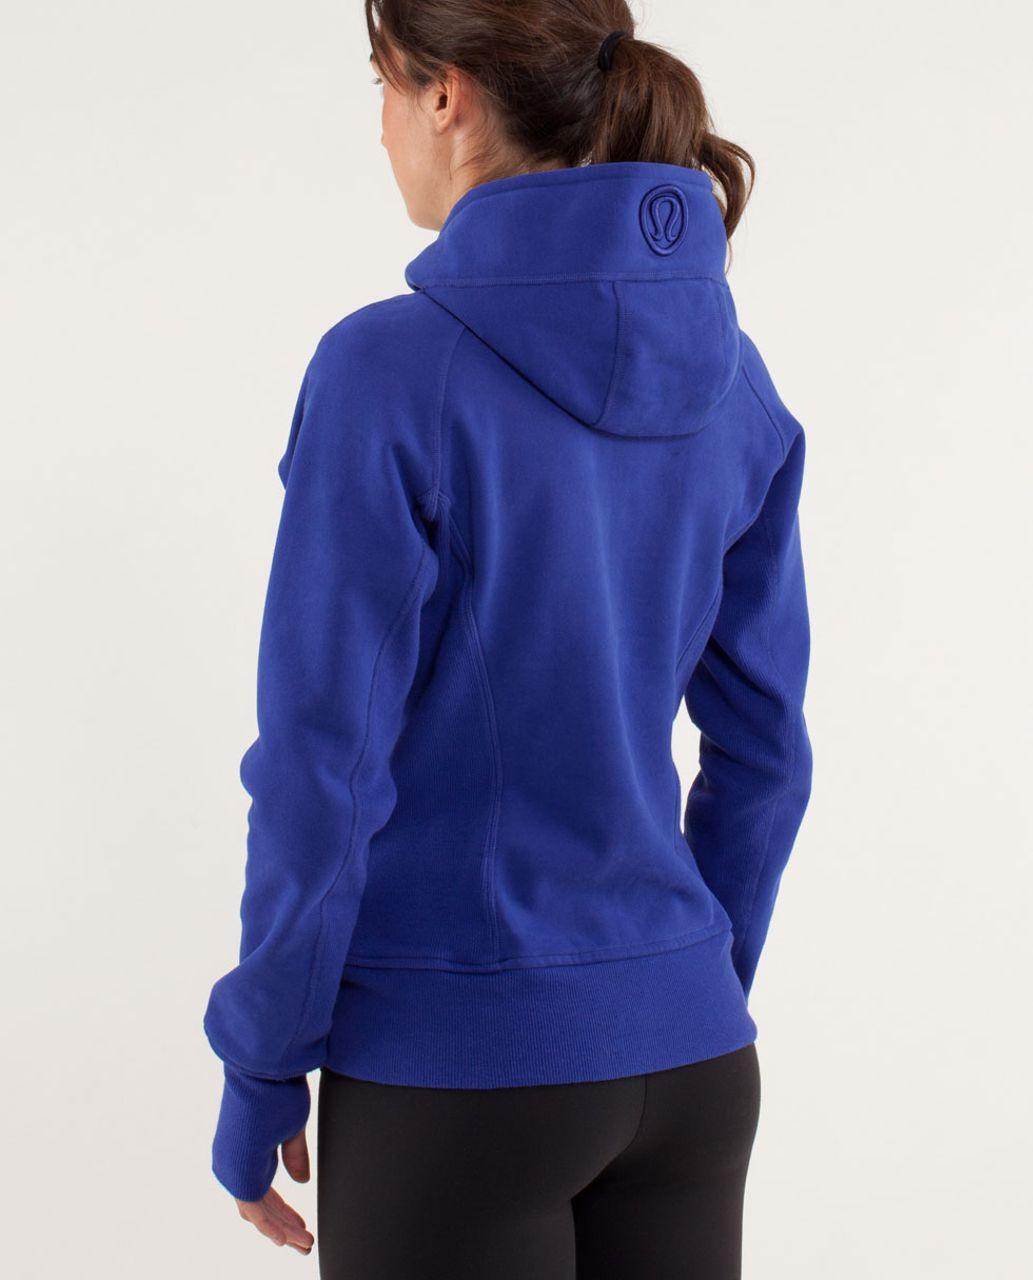 Lululemon Scuba Hoodie - Pigment Blue